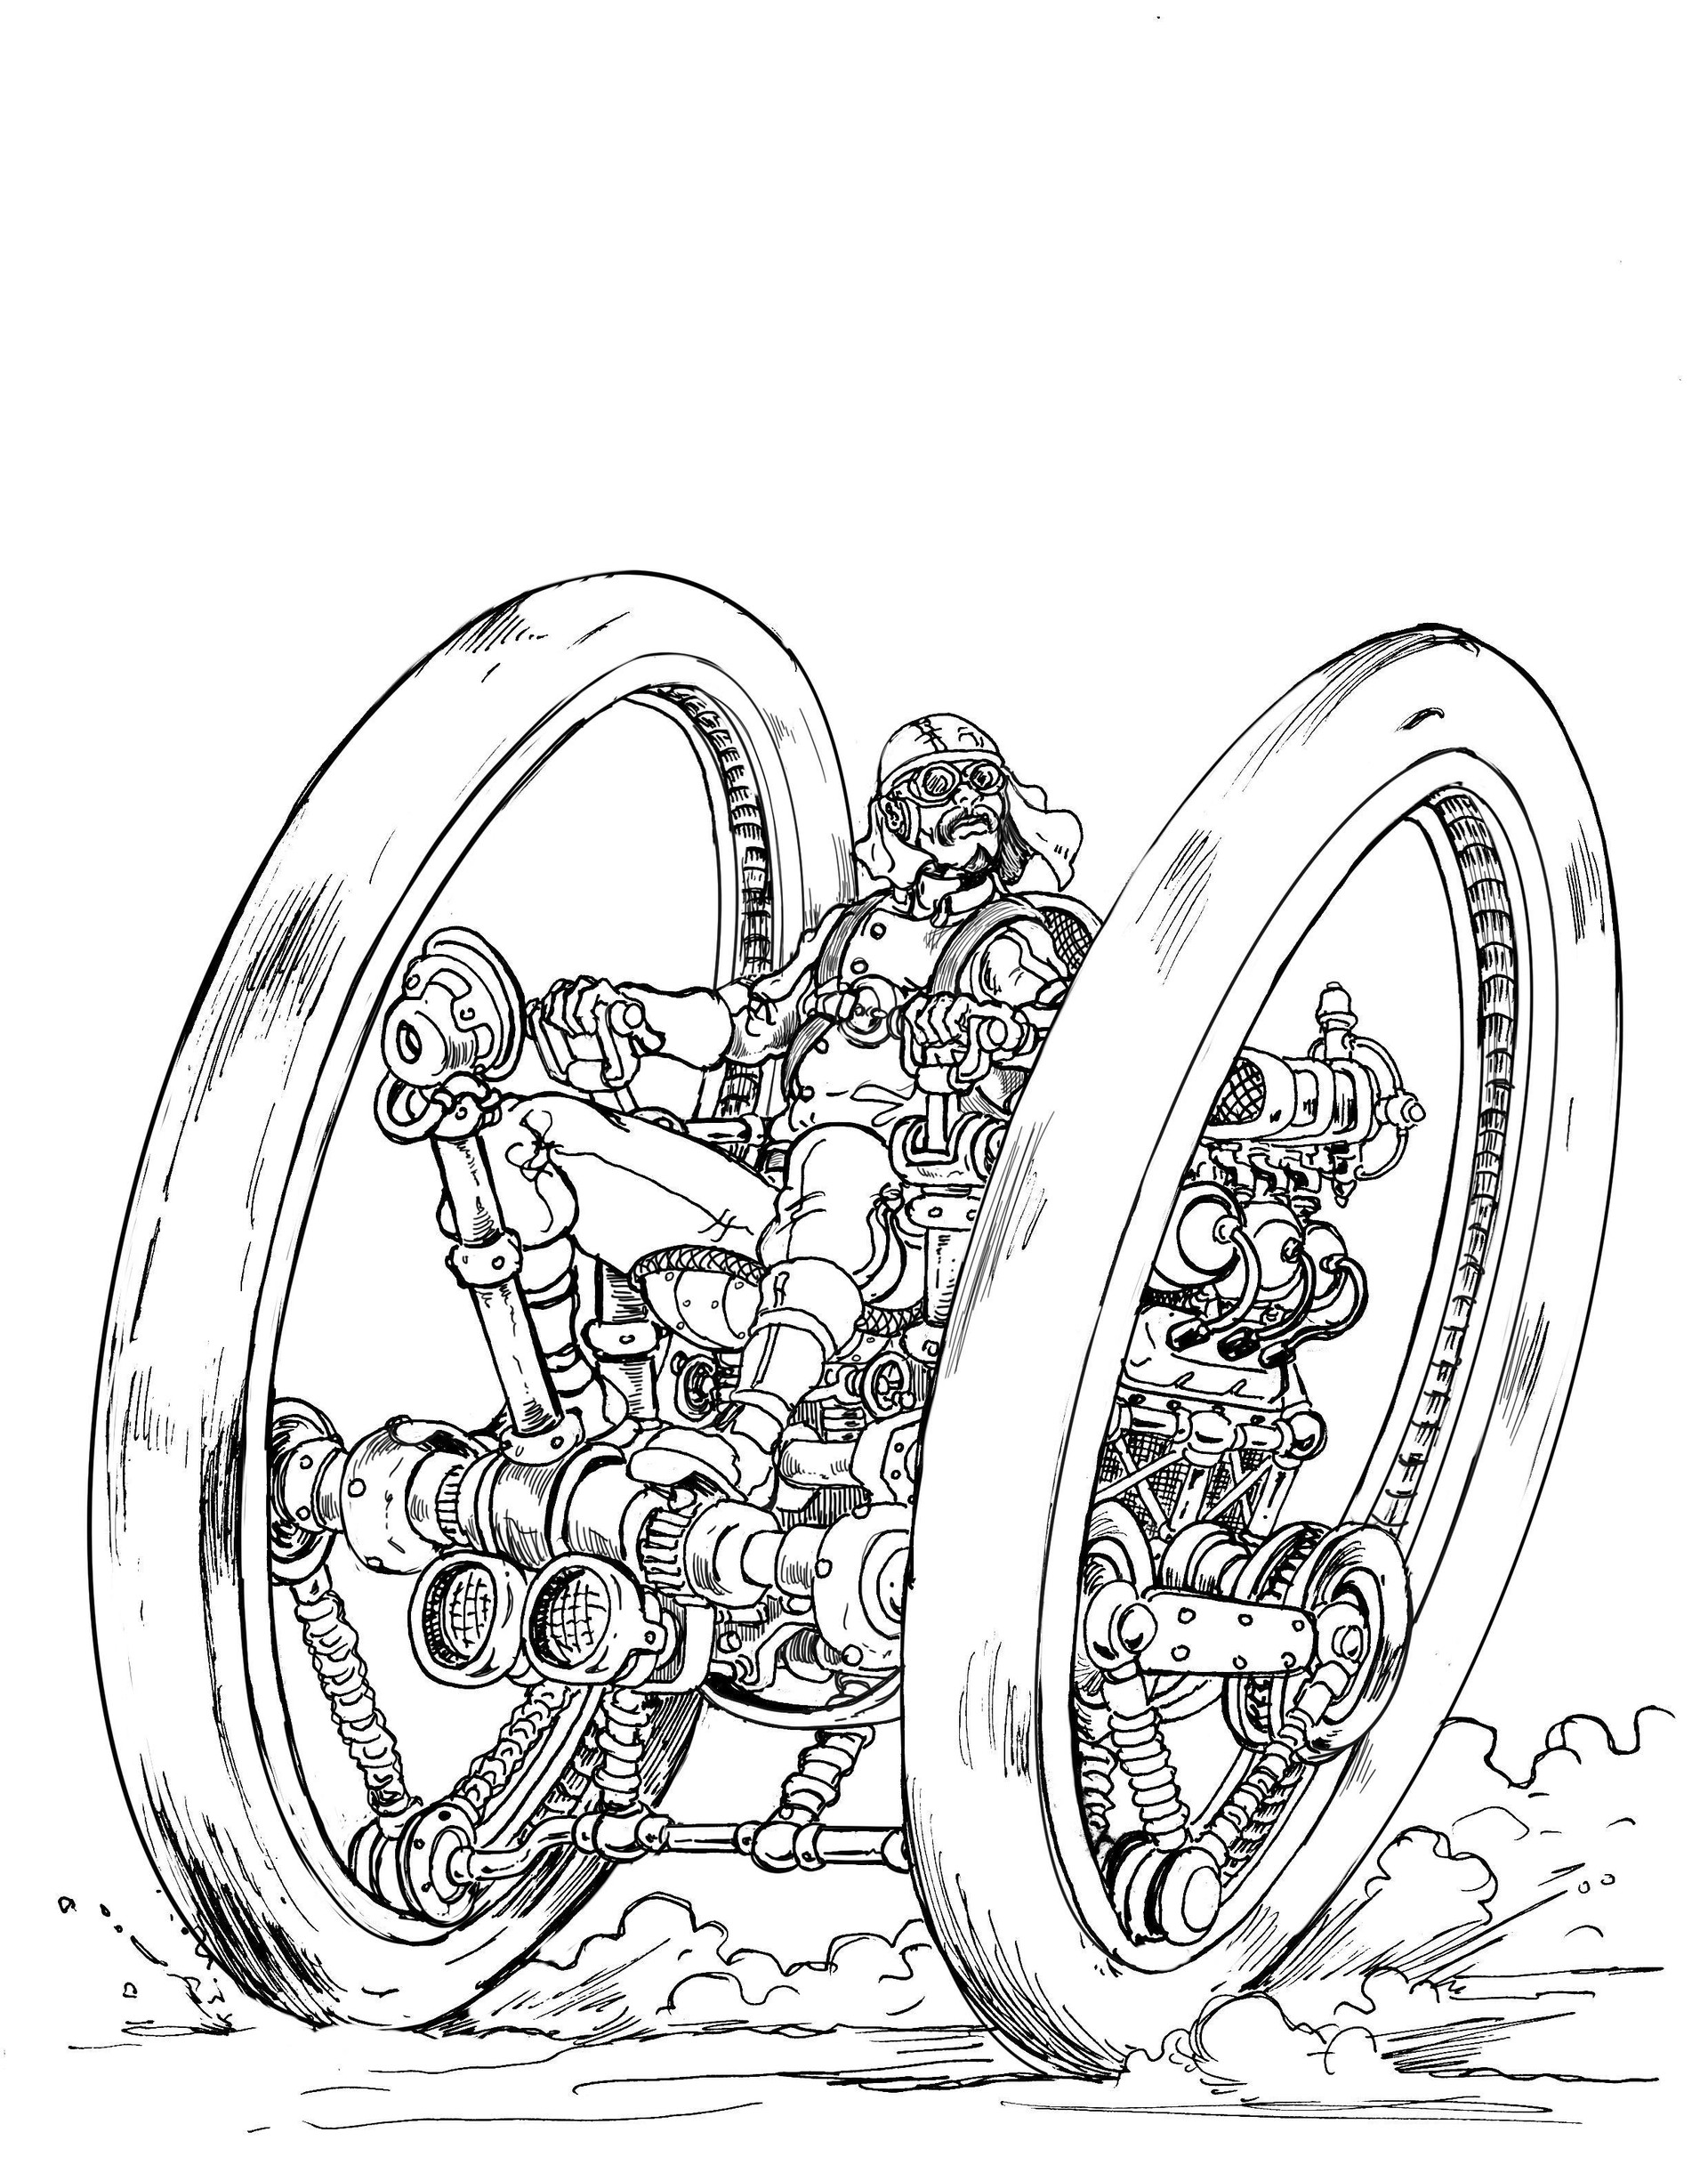 Vincent bryant twowheeler inked 2